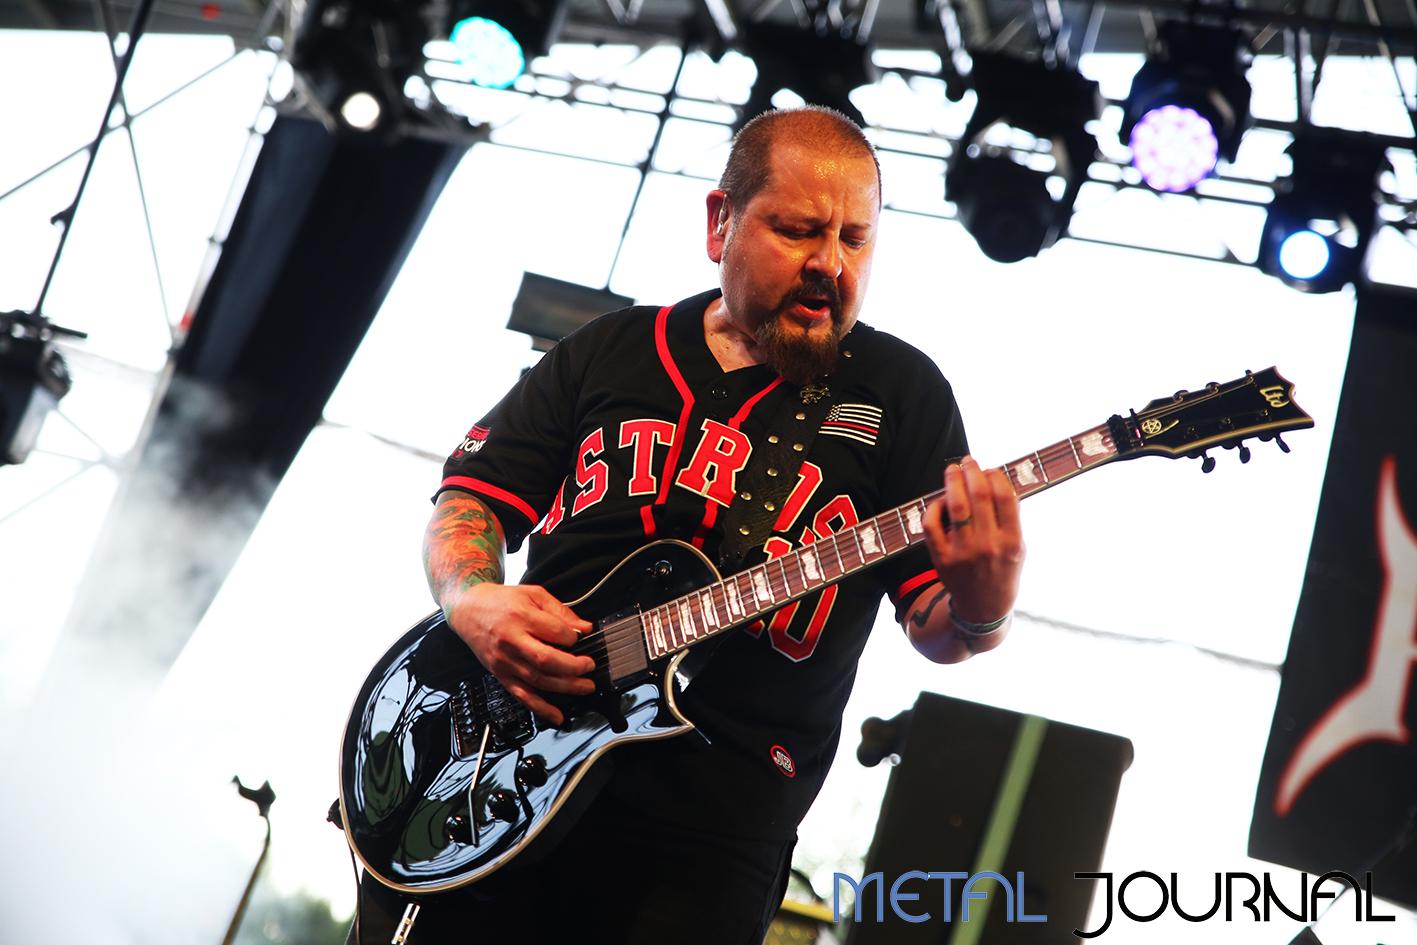 helstar - leyendas del rock 2019 metal journal pic 5